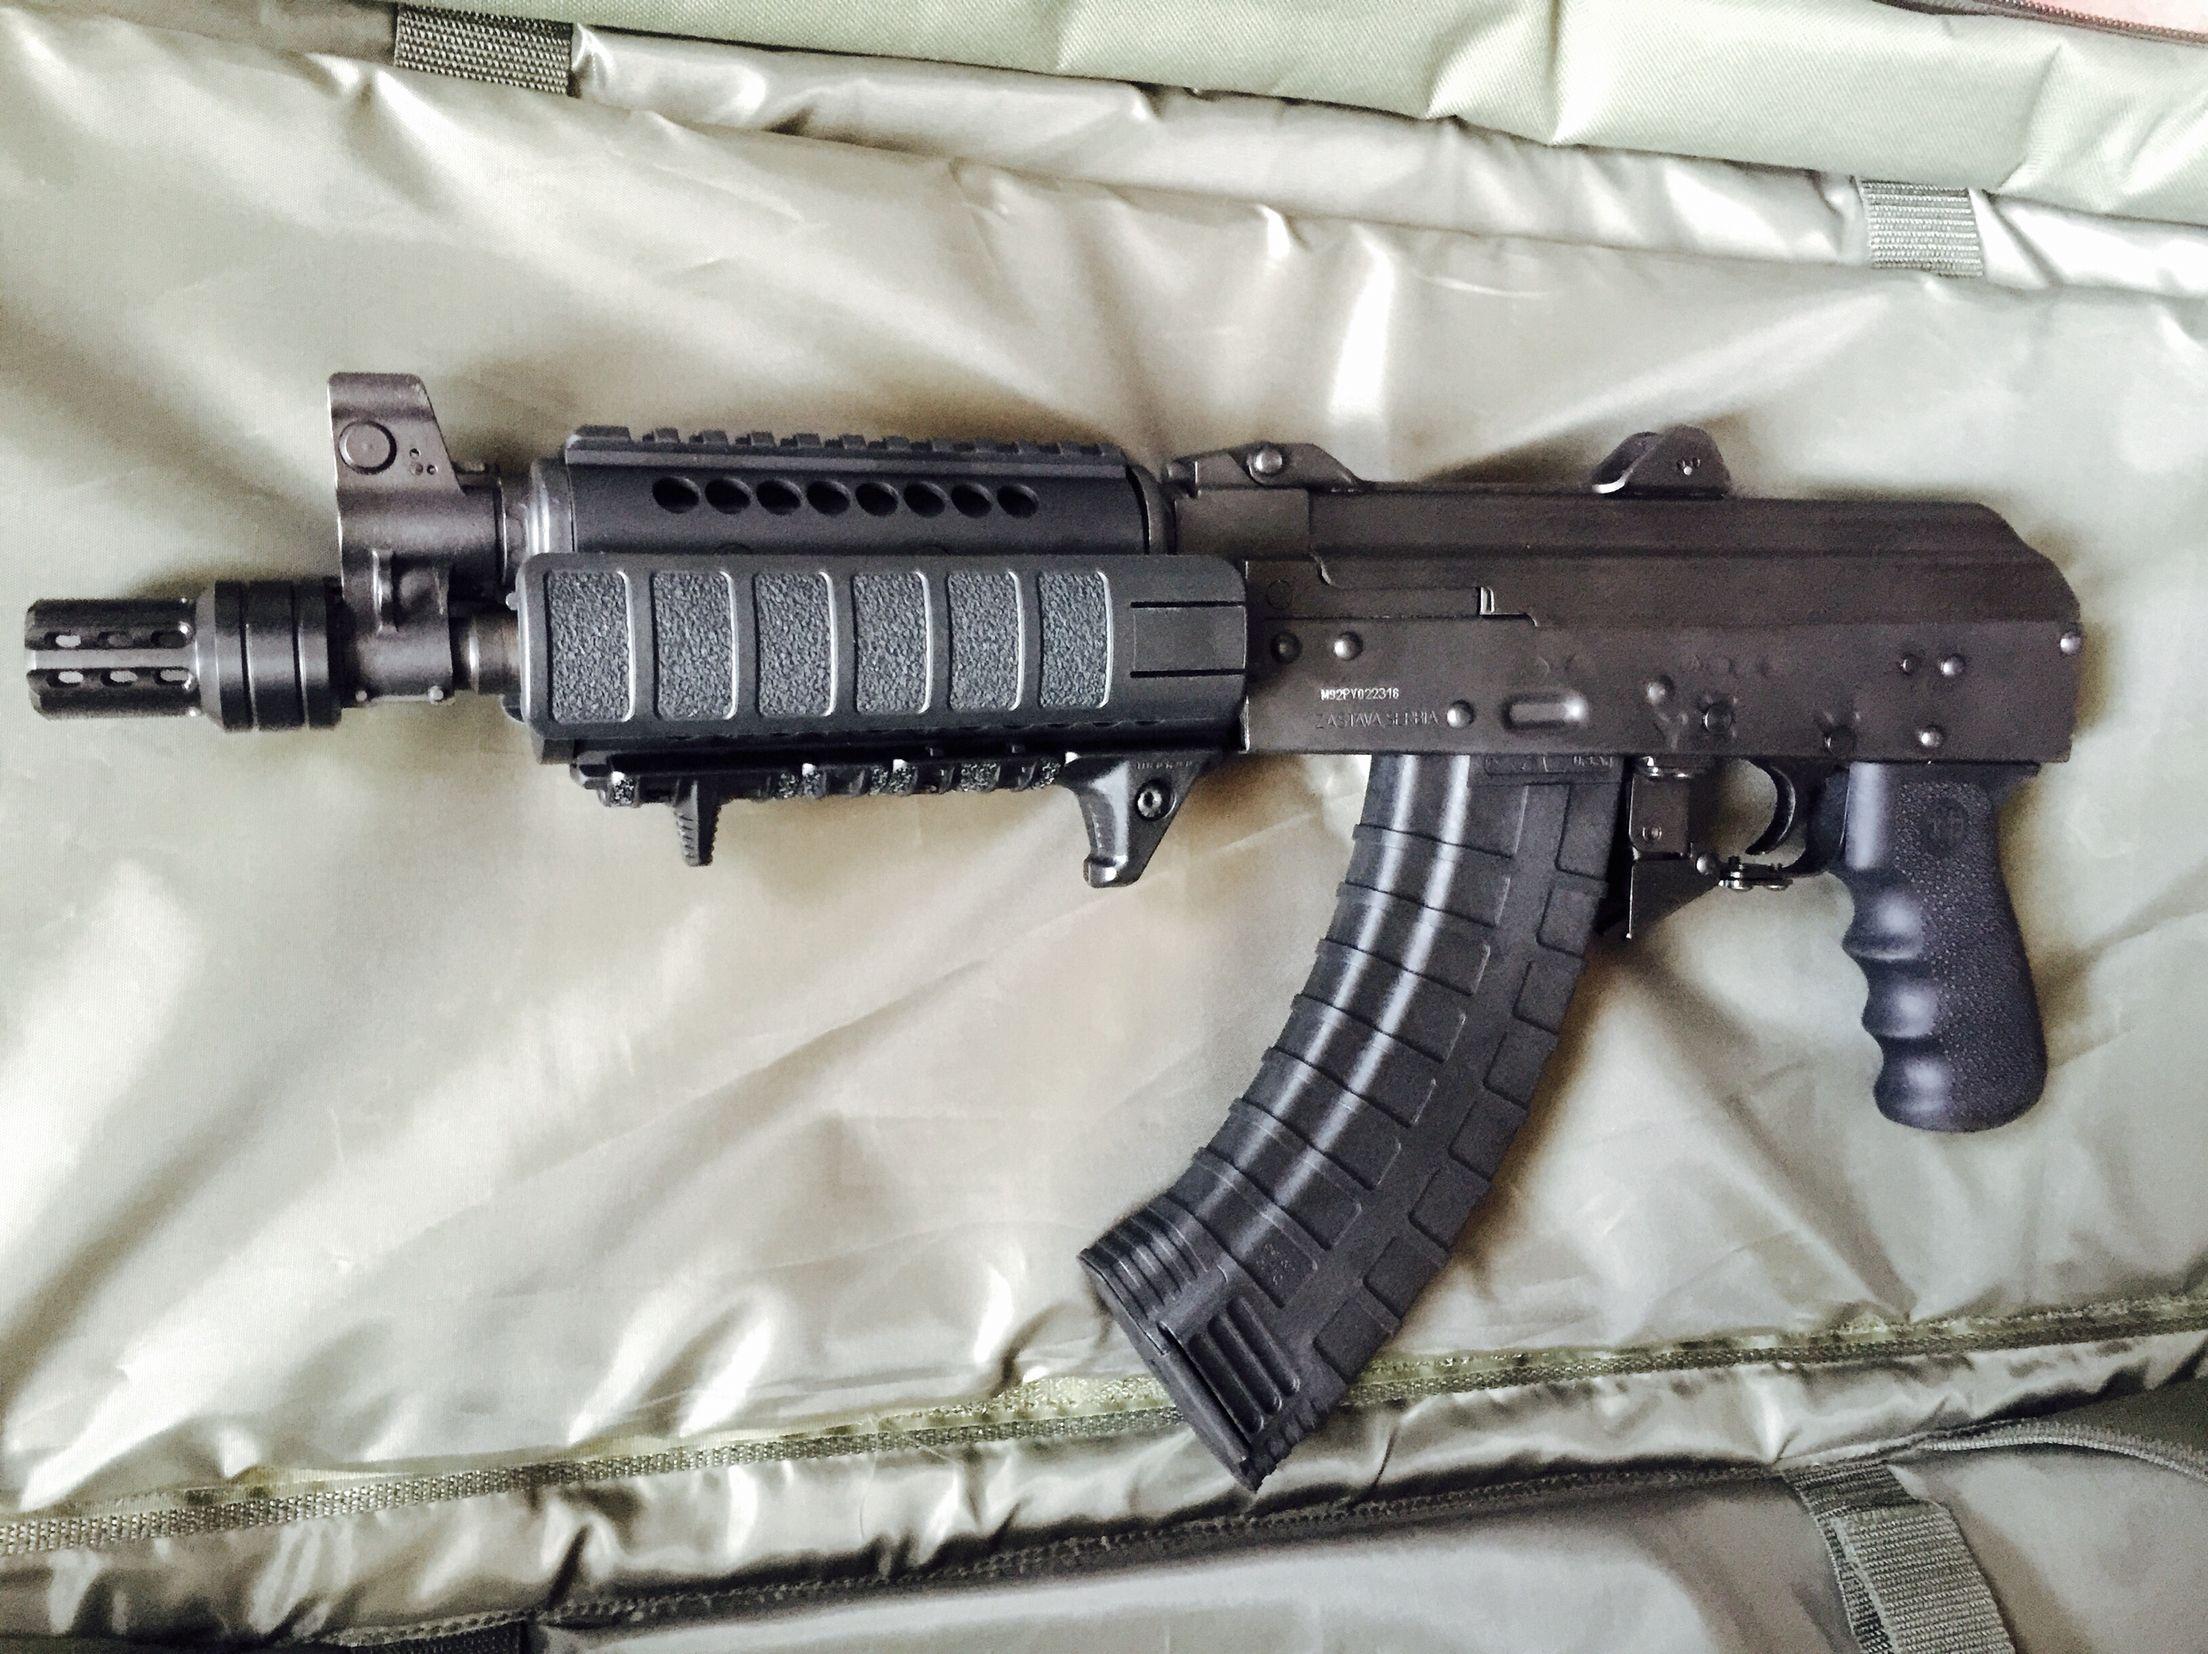 M92 AK pistol w/ Midwest Industries rail, manticore night